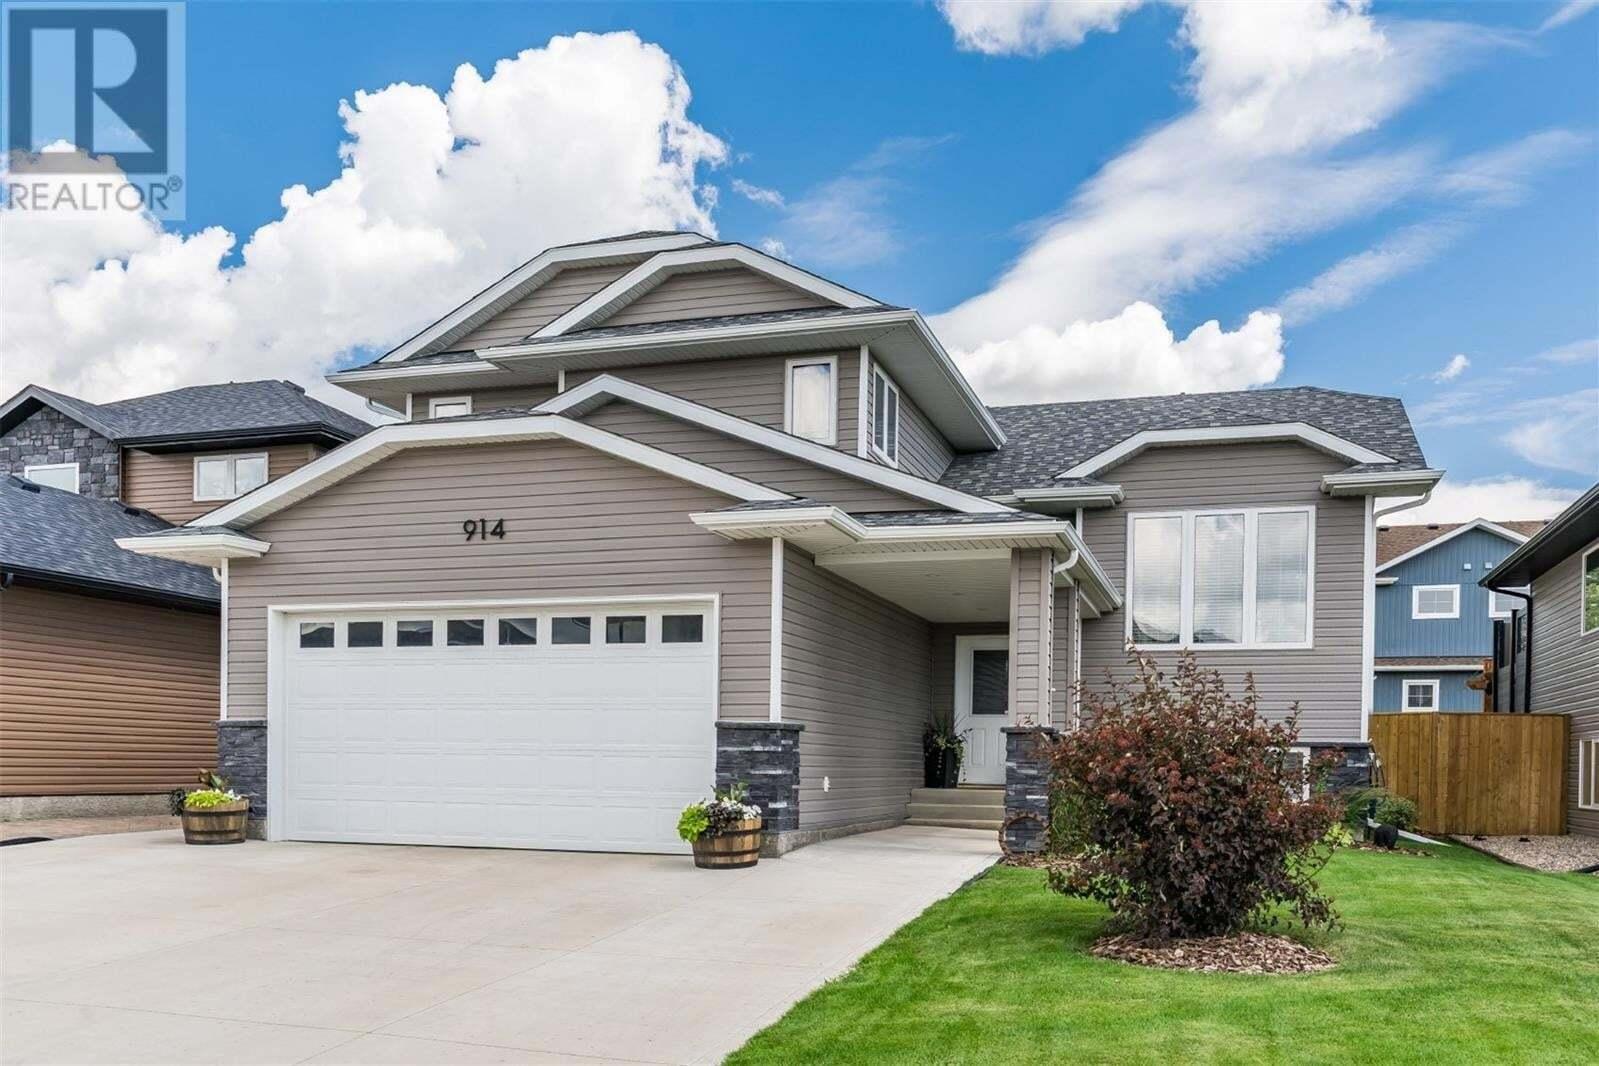 House for sale at 914 Sauer Cres Saskatoon Saskatchewan - MLS: SK817694